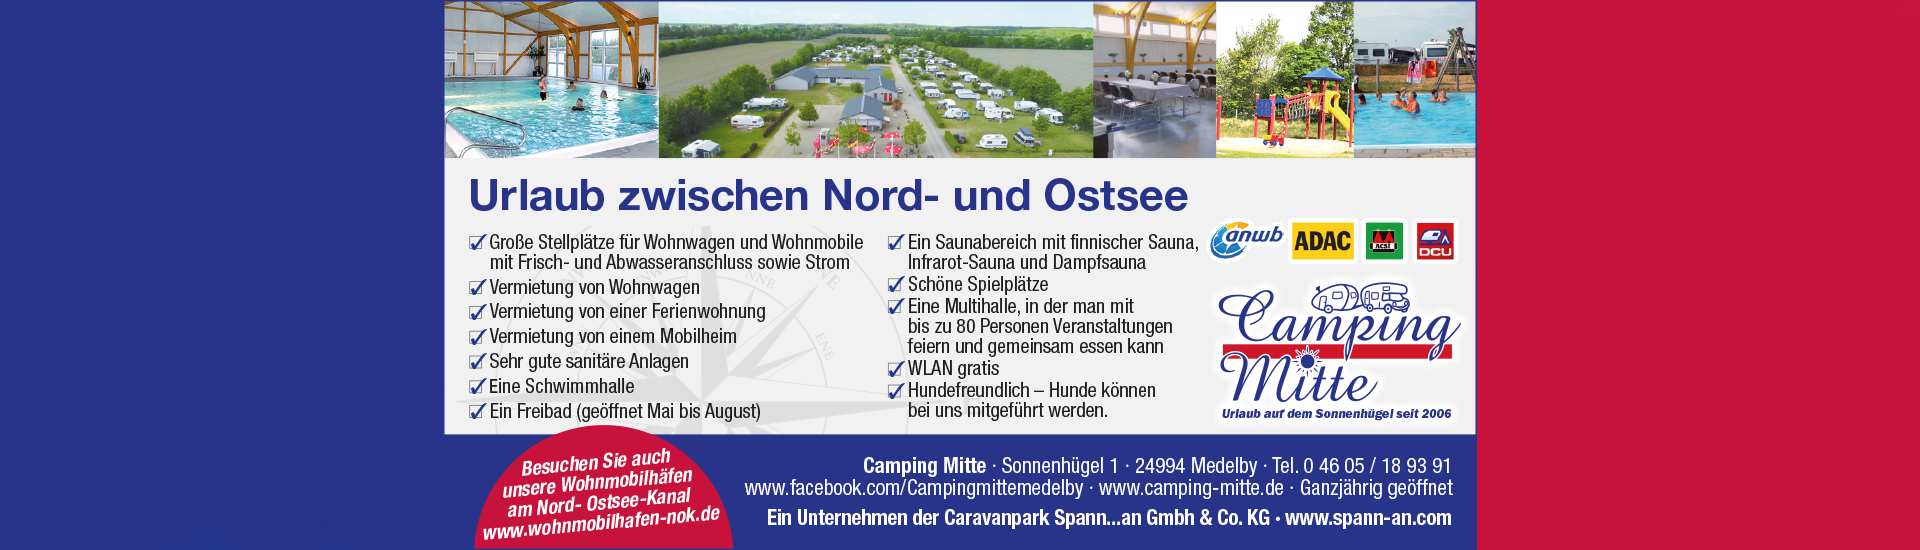 www.camping-mitte.de